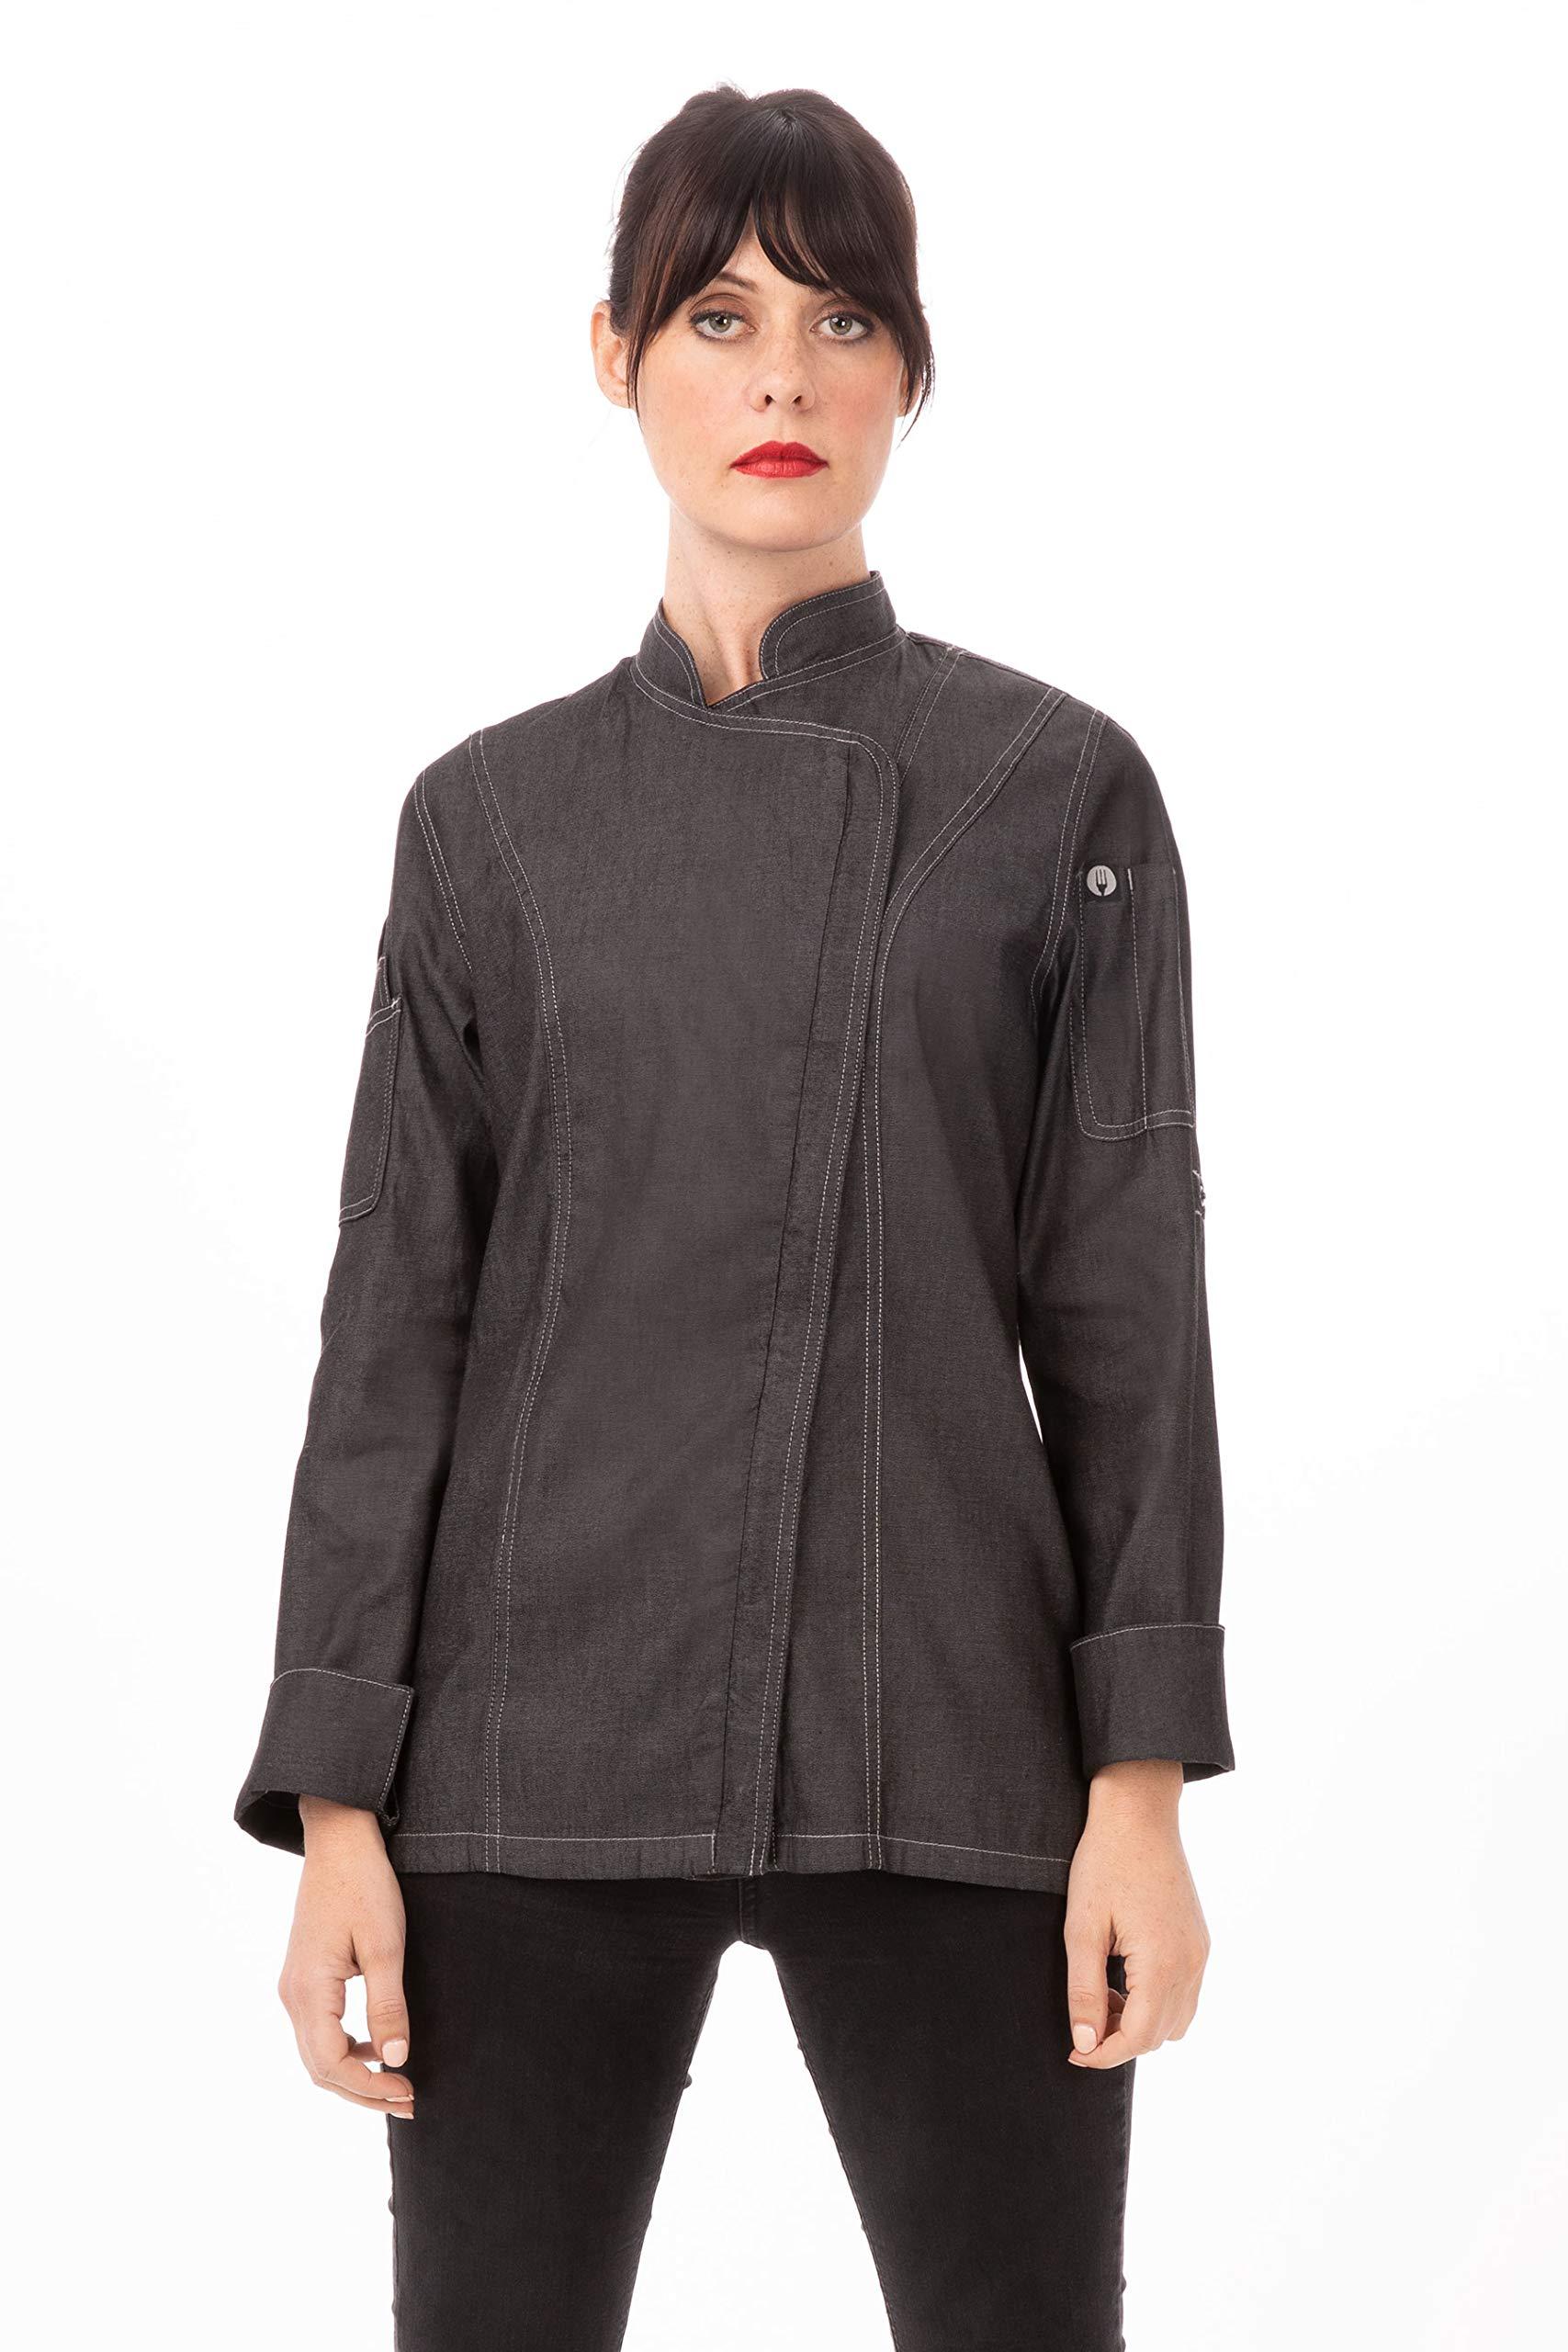 Chef Works Women's Gramercy Denim Chef Coat, Black, X-Large by Chef Works